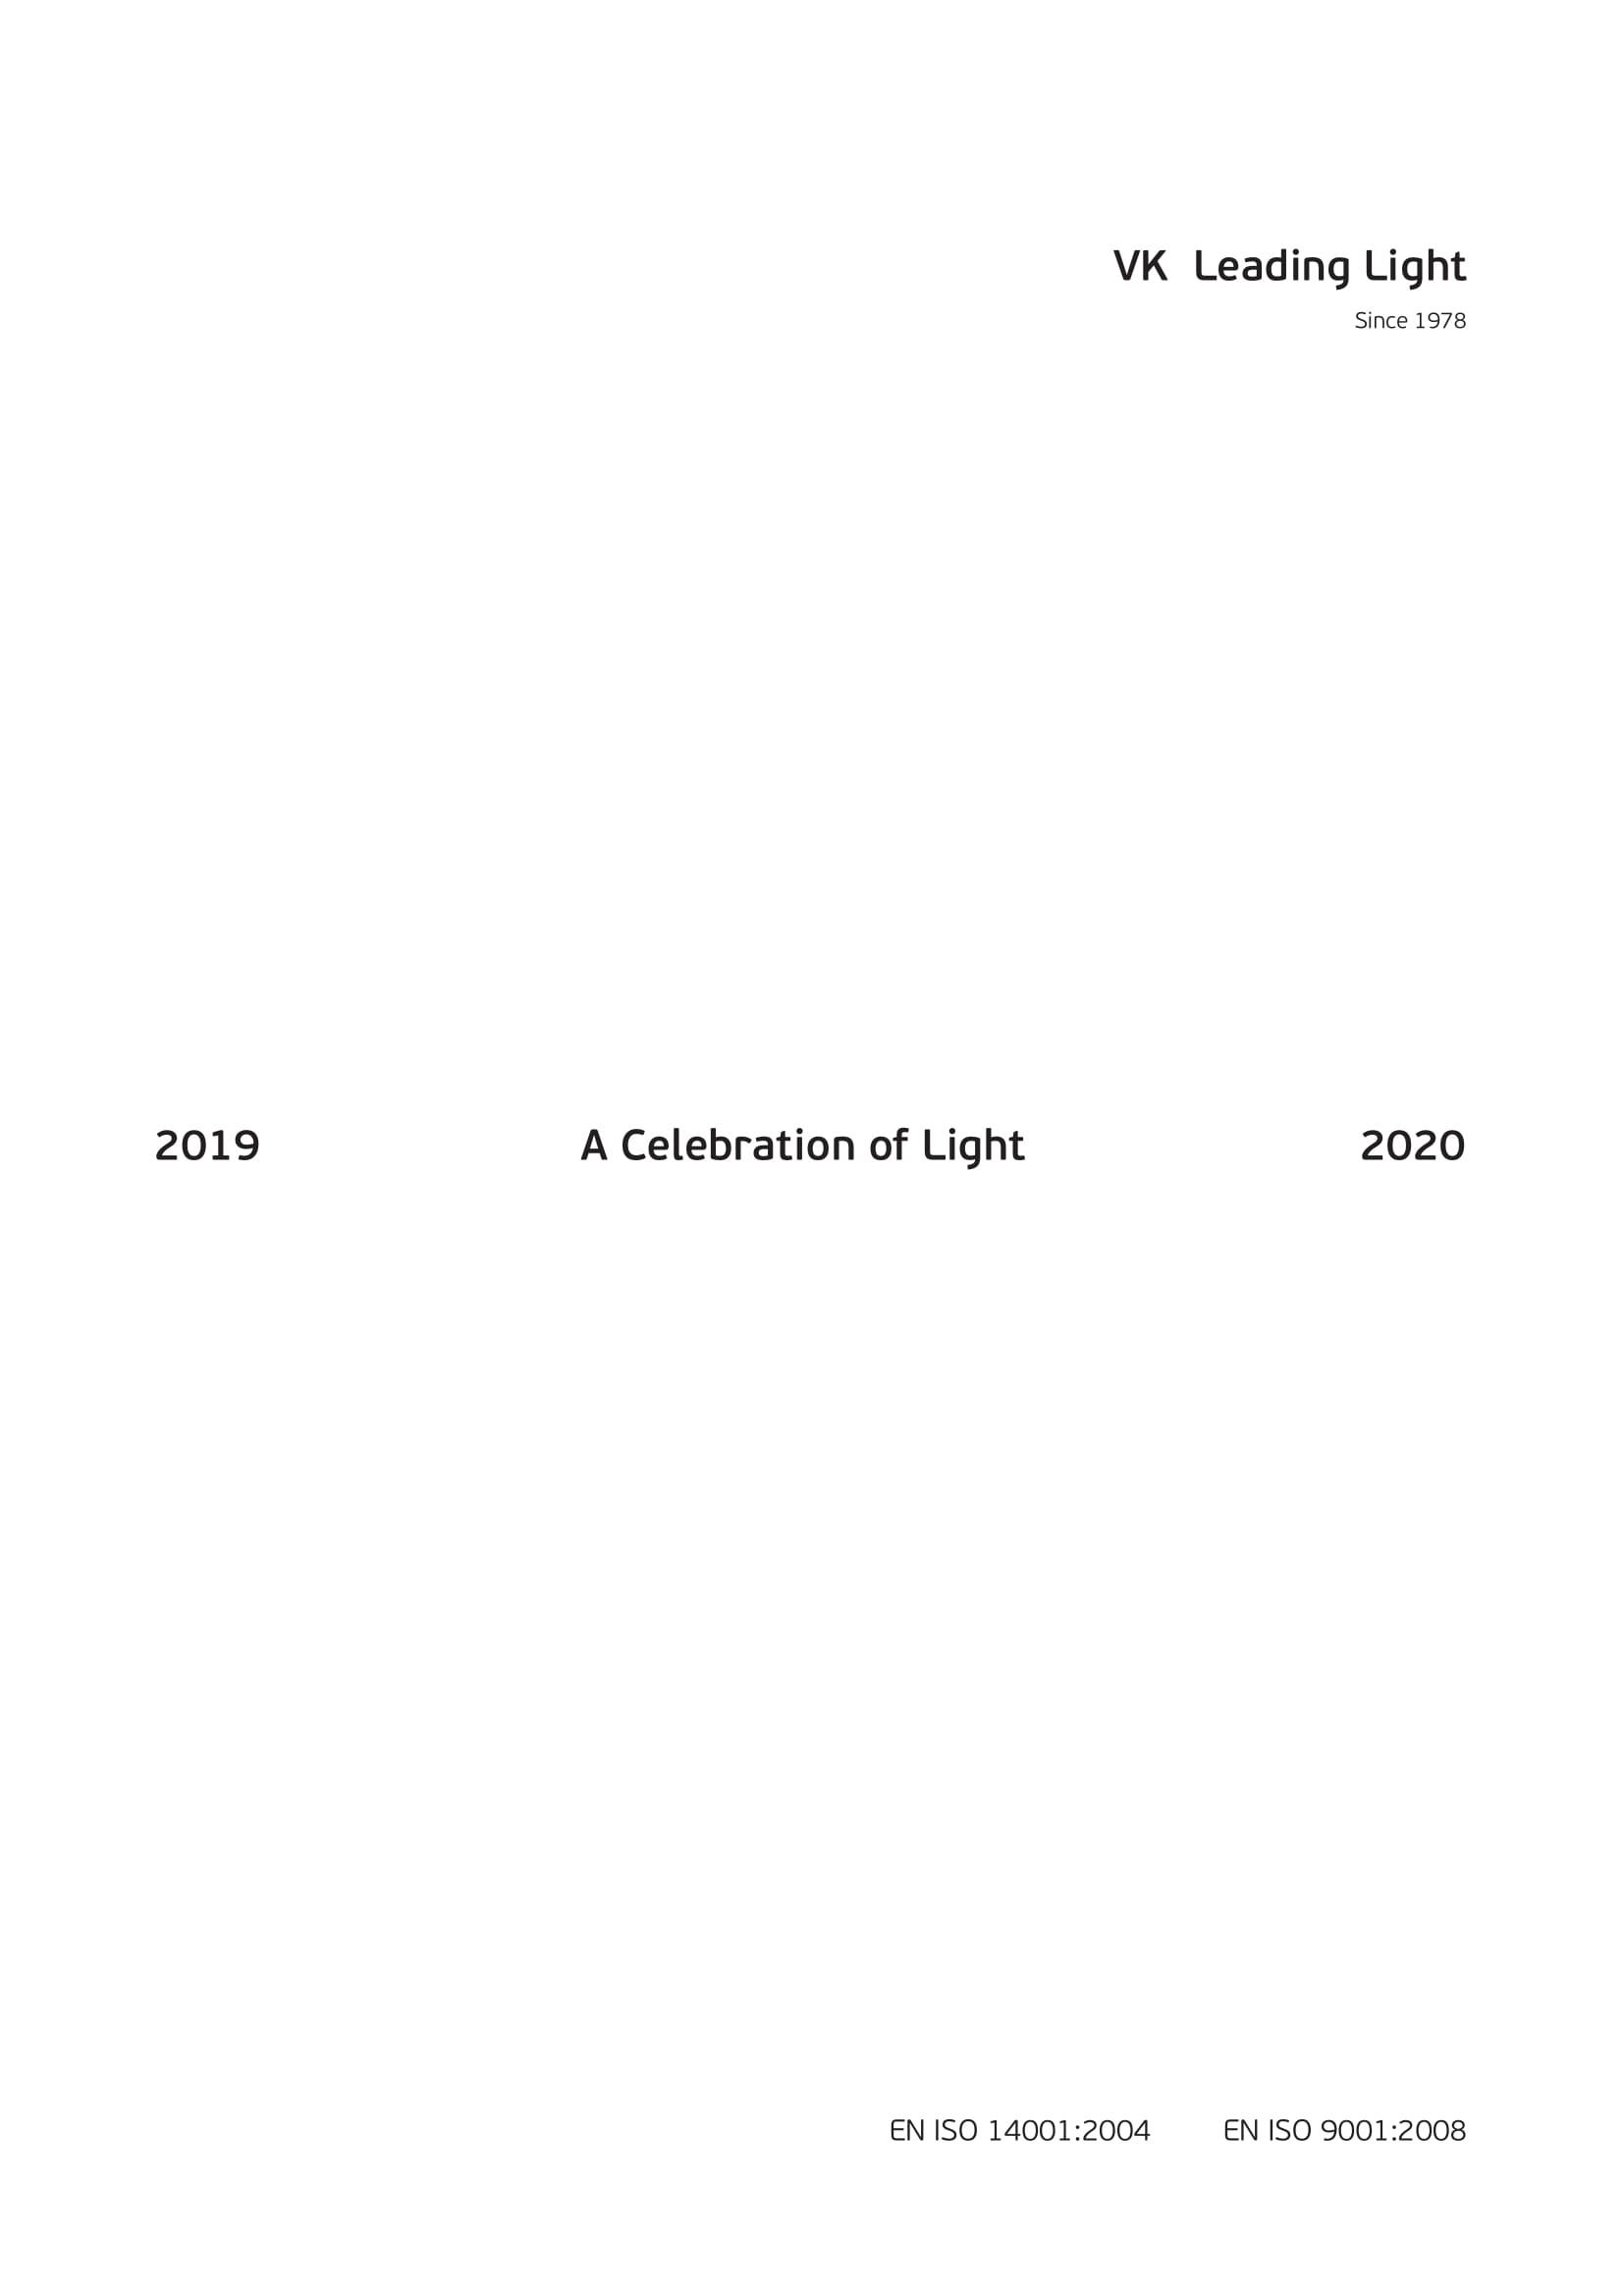 VK LED 2021